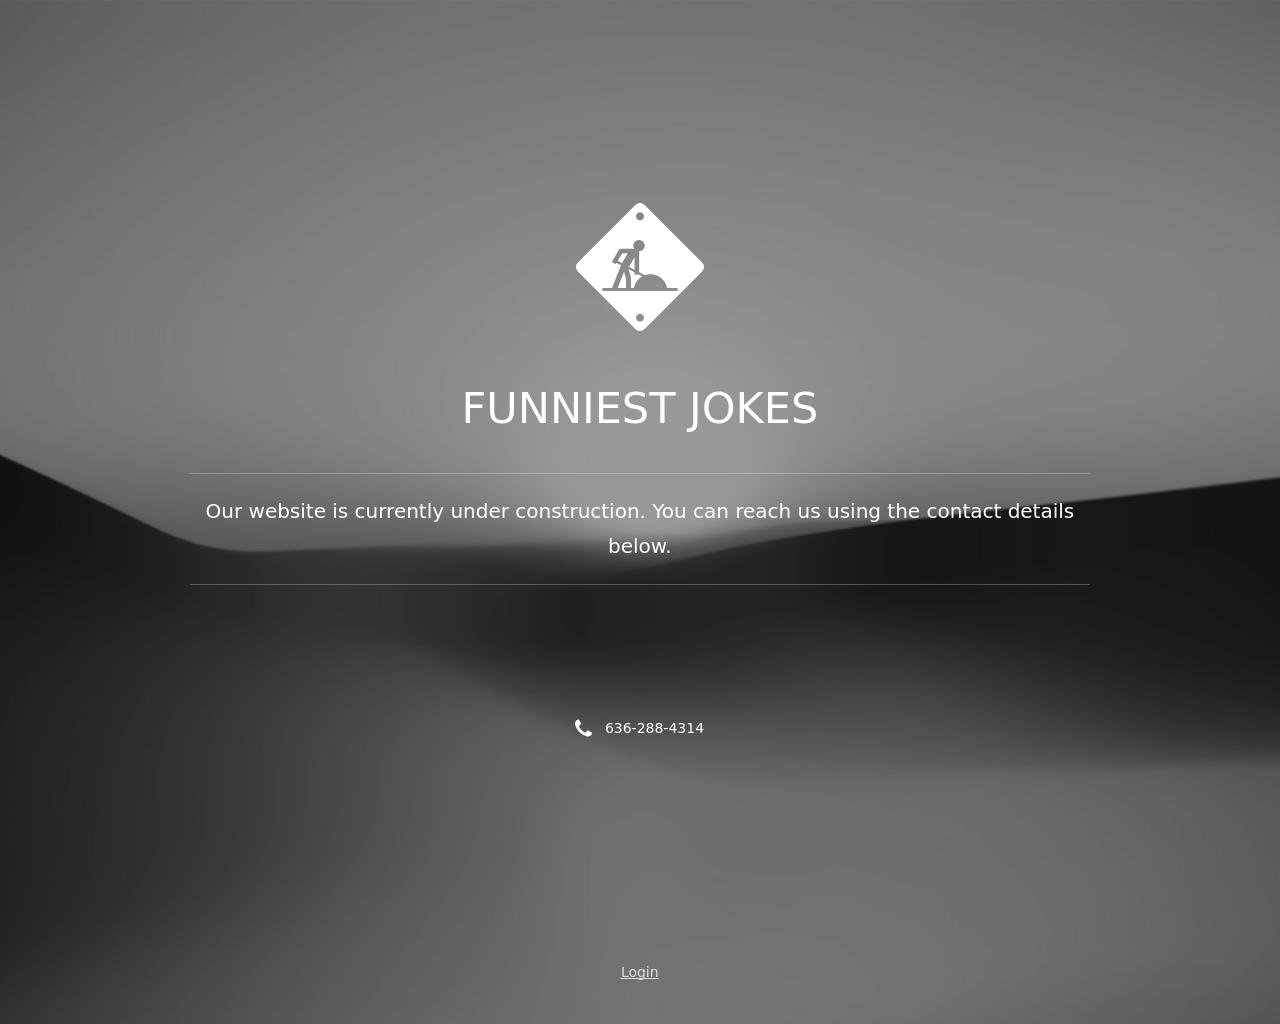 Funniest-Jokes-Advertising-Reviews-Pricing